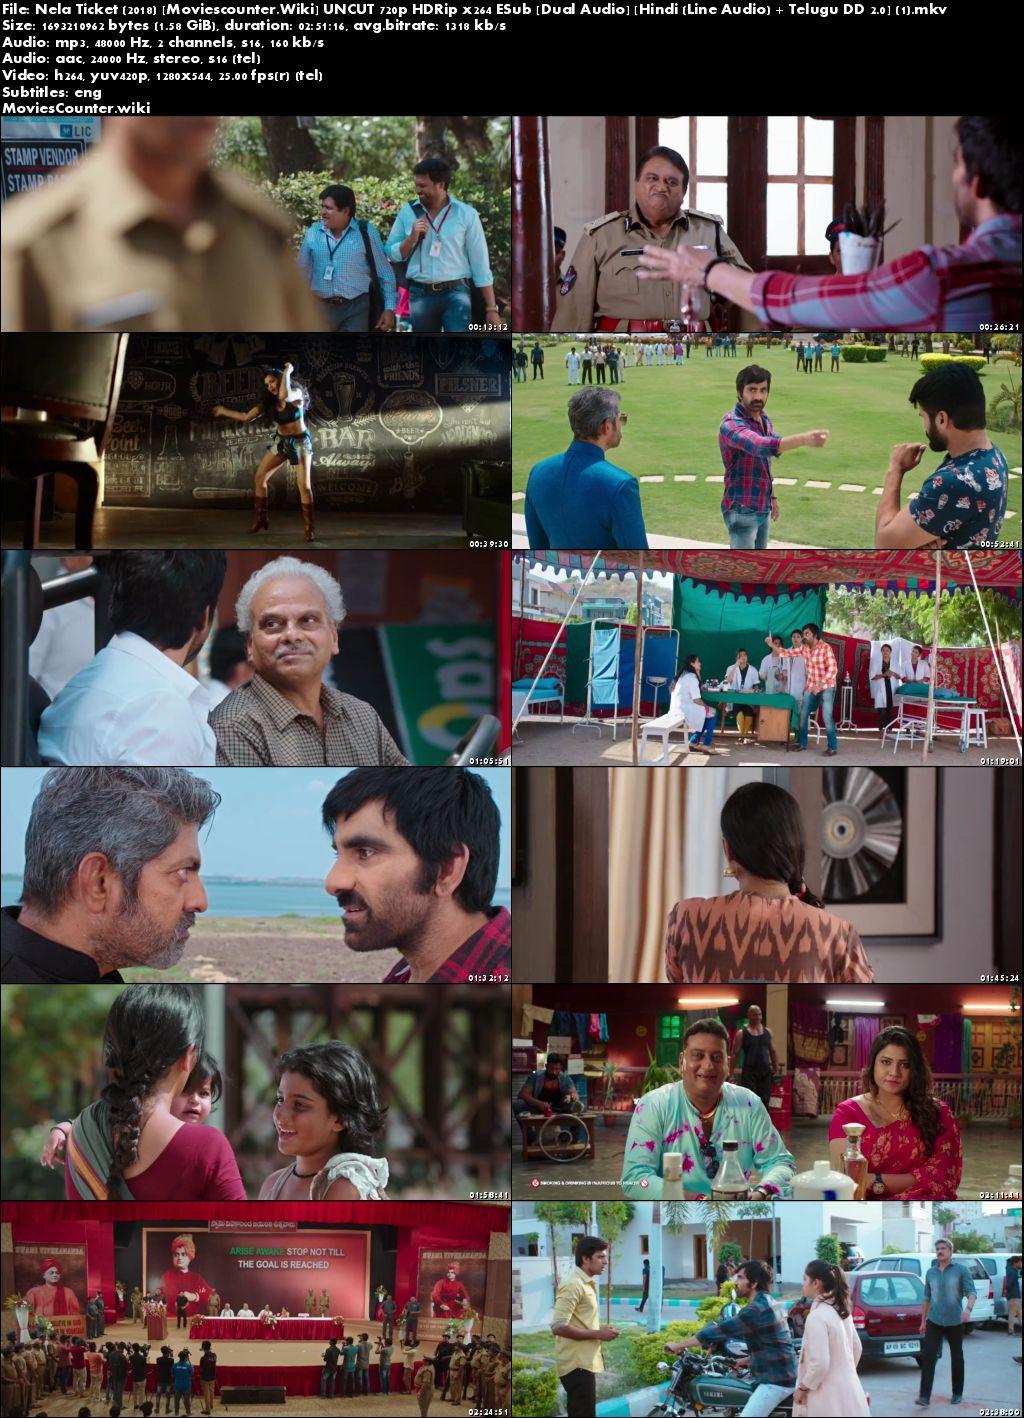 Screen Shots Nela Ticket 2018 Hindi Dubbed HD 720p